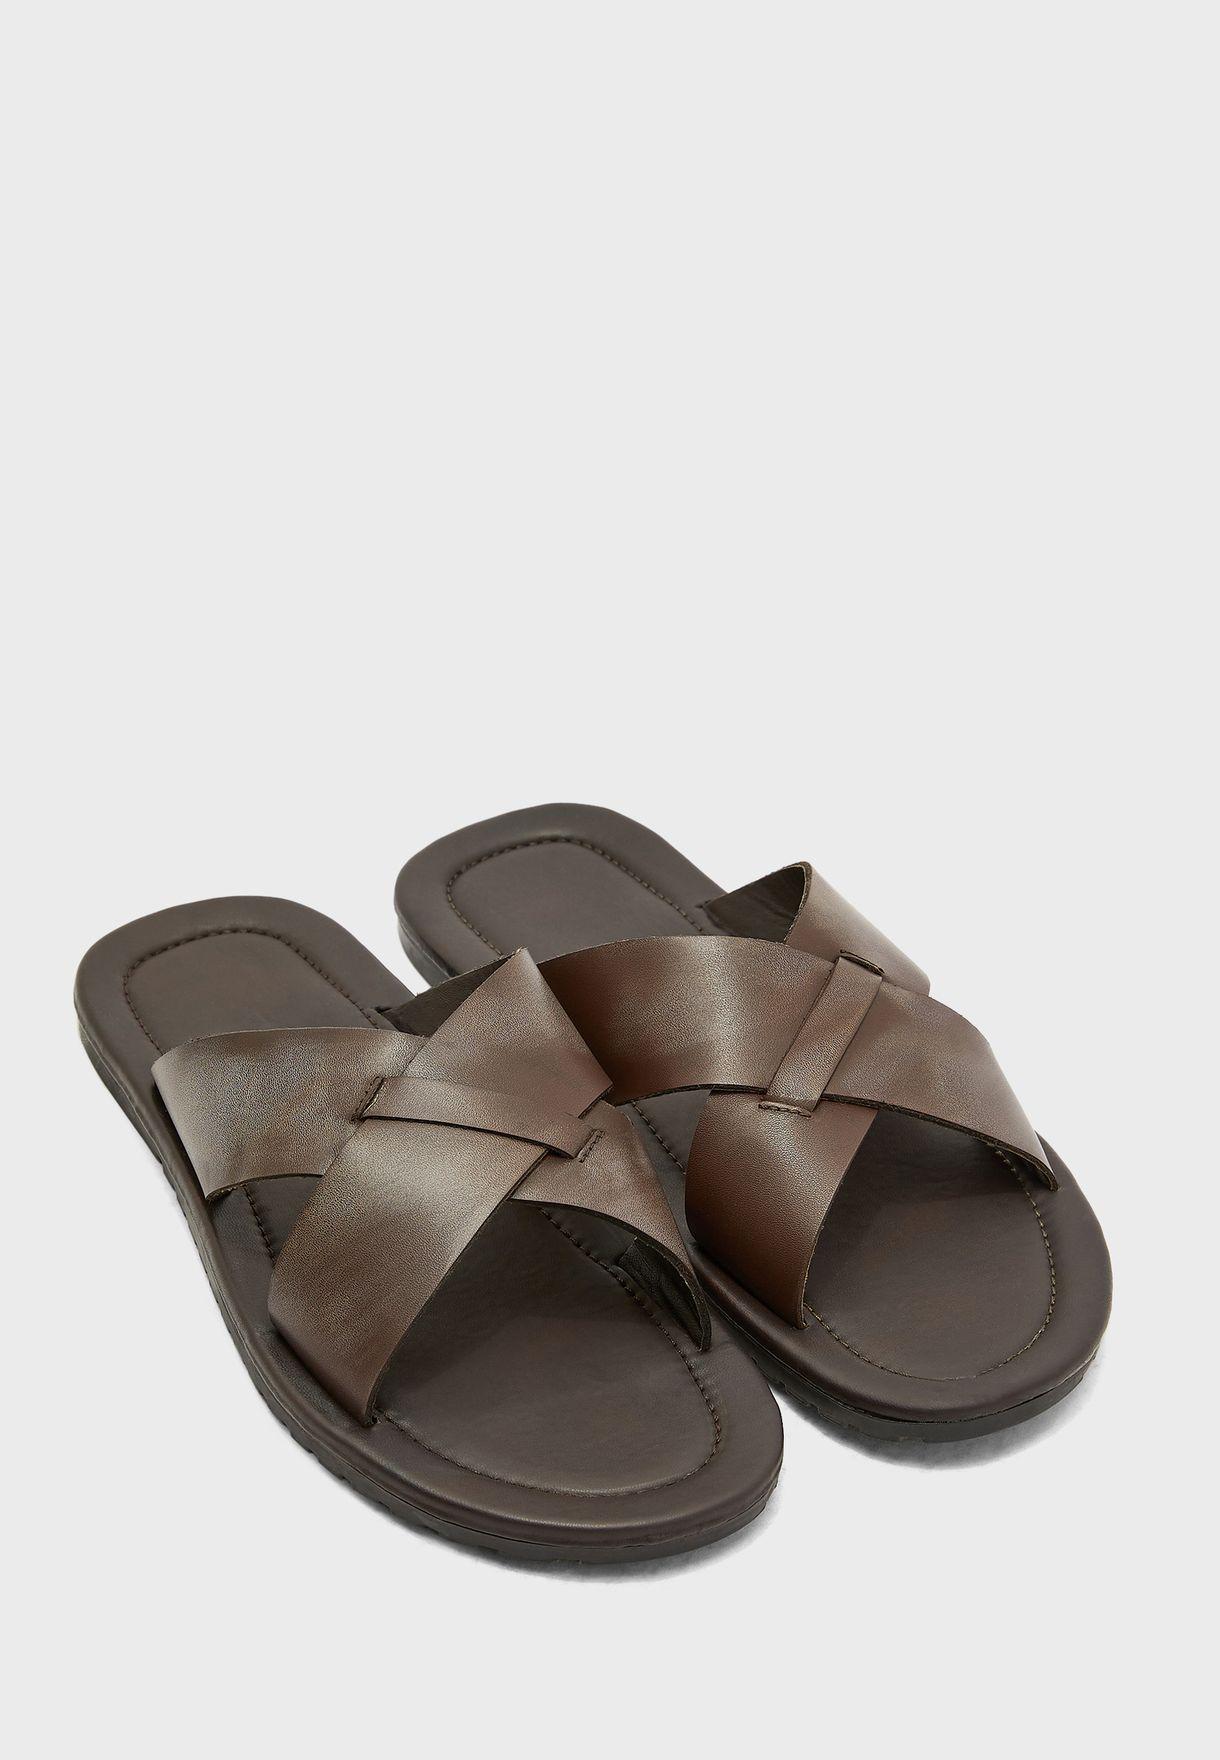 Genuine Leather Cross Strap Sandals